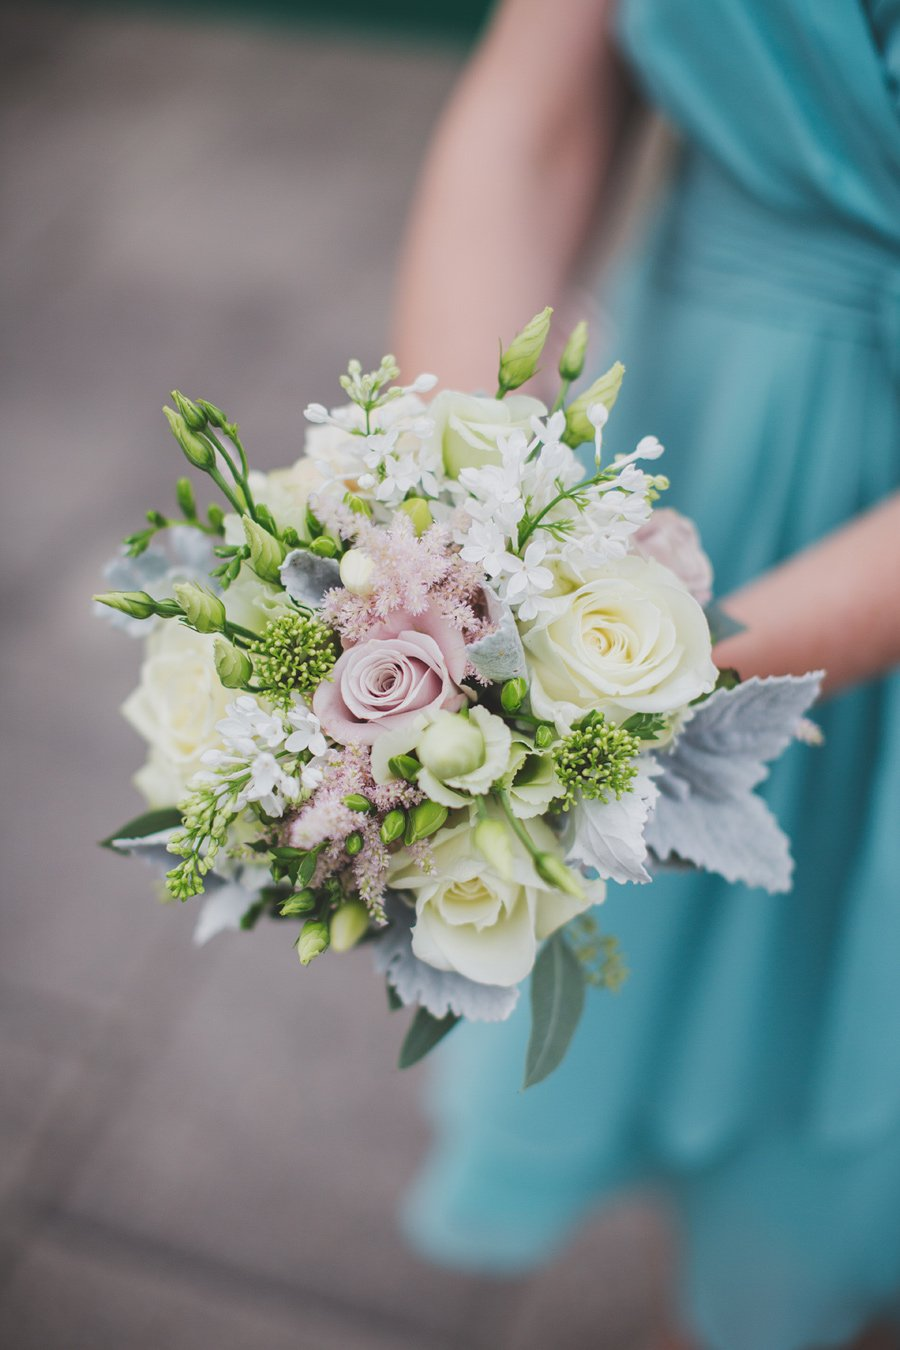 Worthing-Dome-Wedding-Photographer-Denise-and-Stefan-Simon-Fazackarley-38